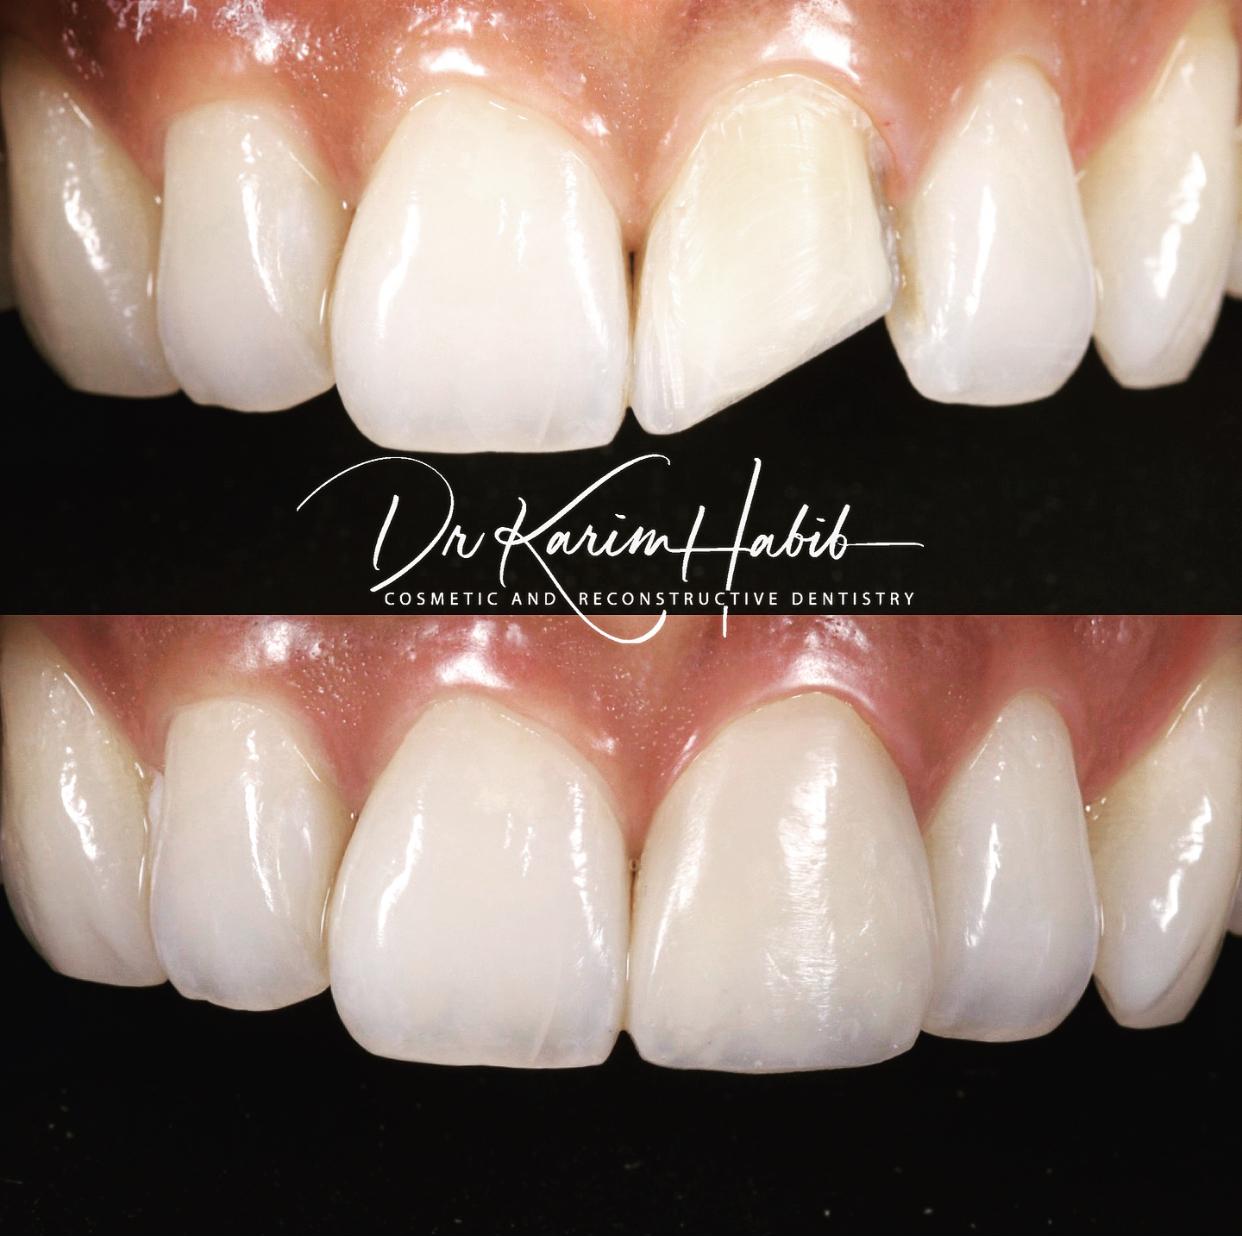 Fractured tooth Repair in Composite